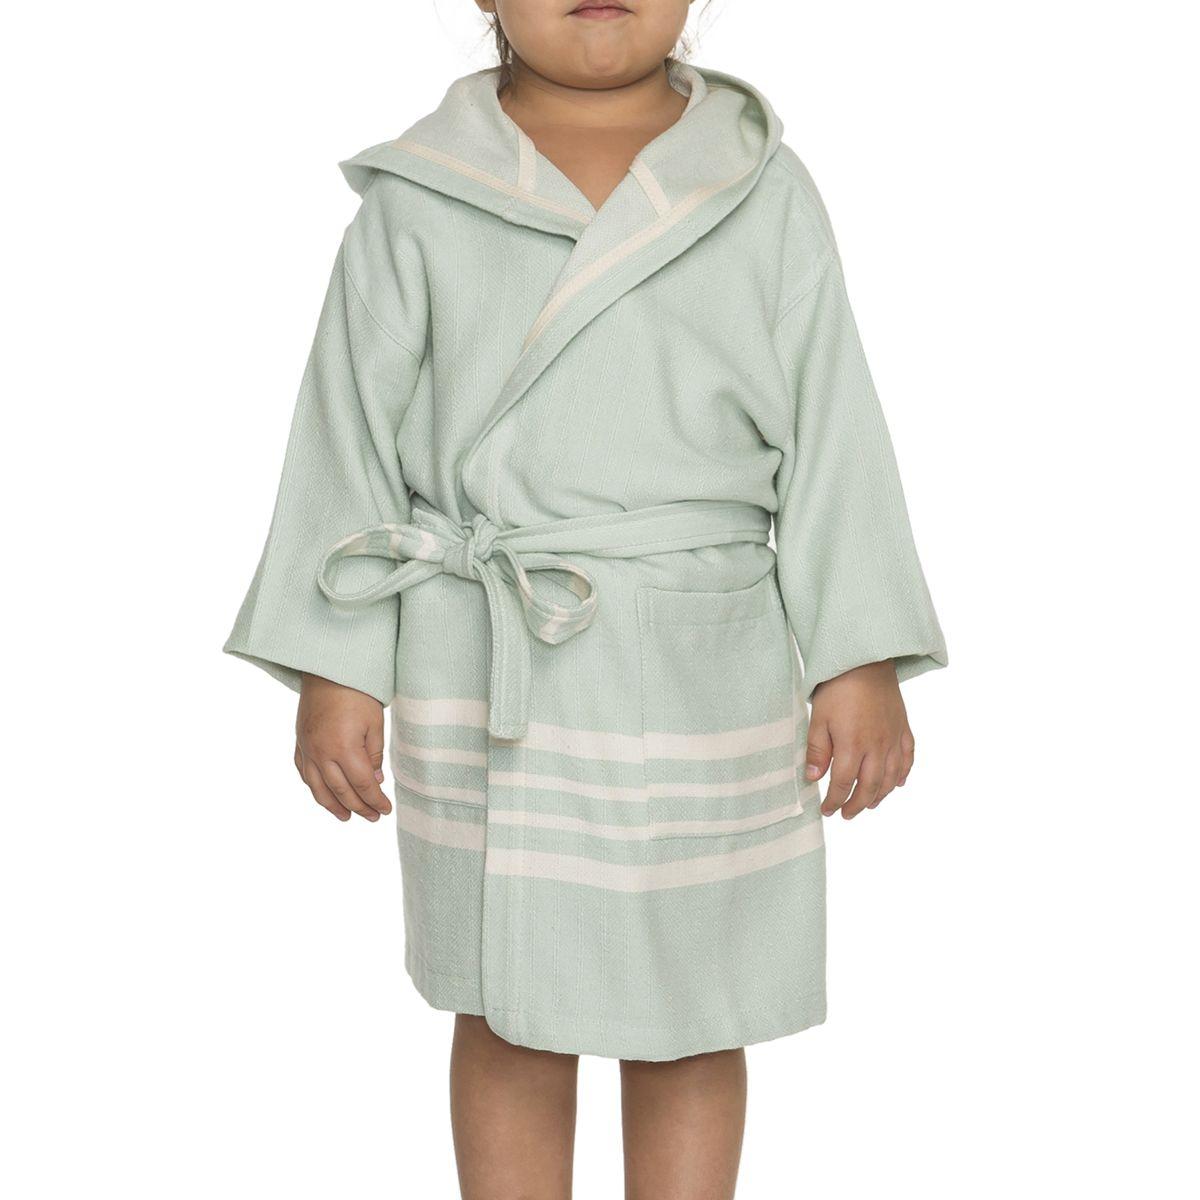 Bathrobe Kiddo with hood - Mint